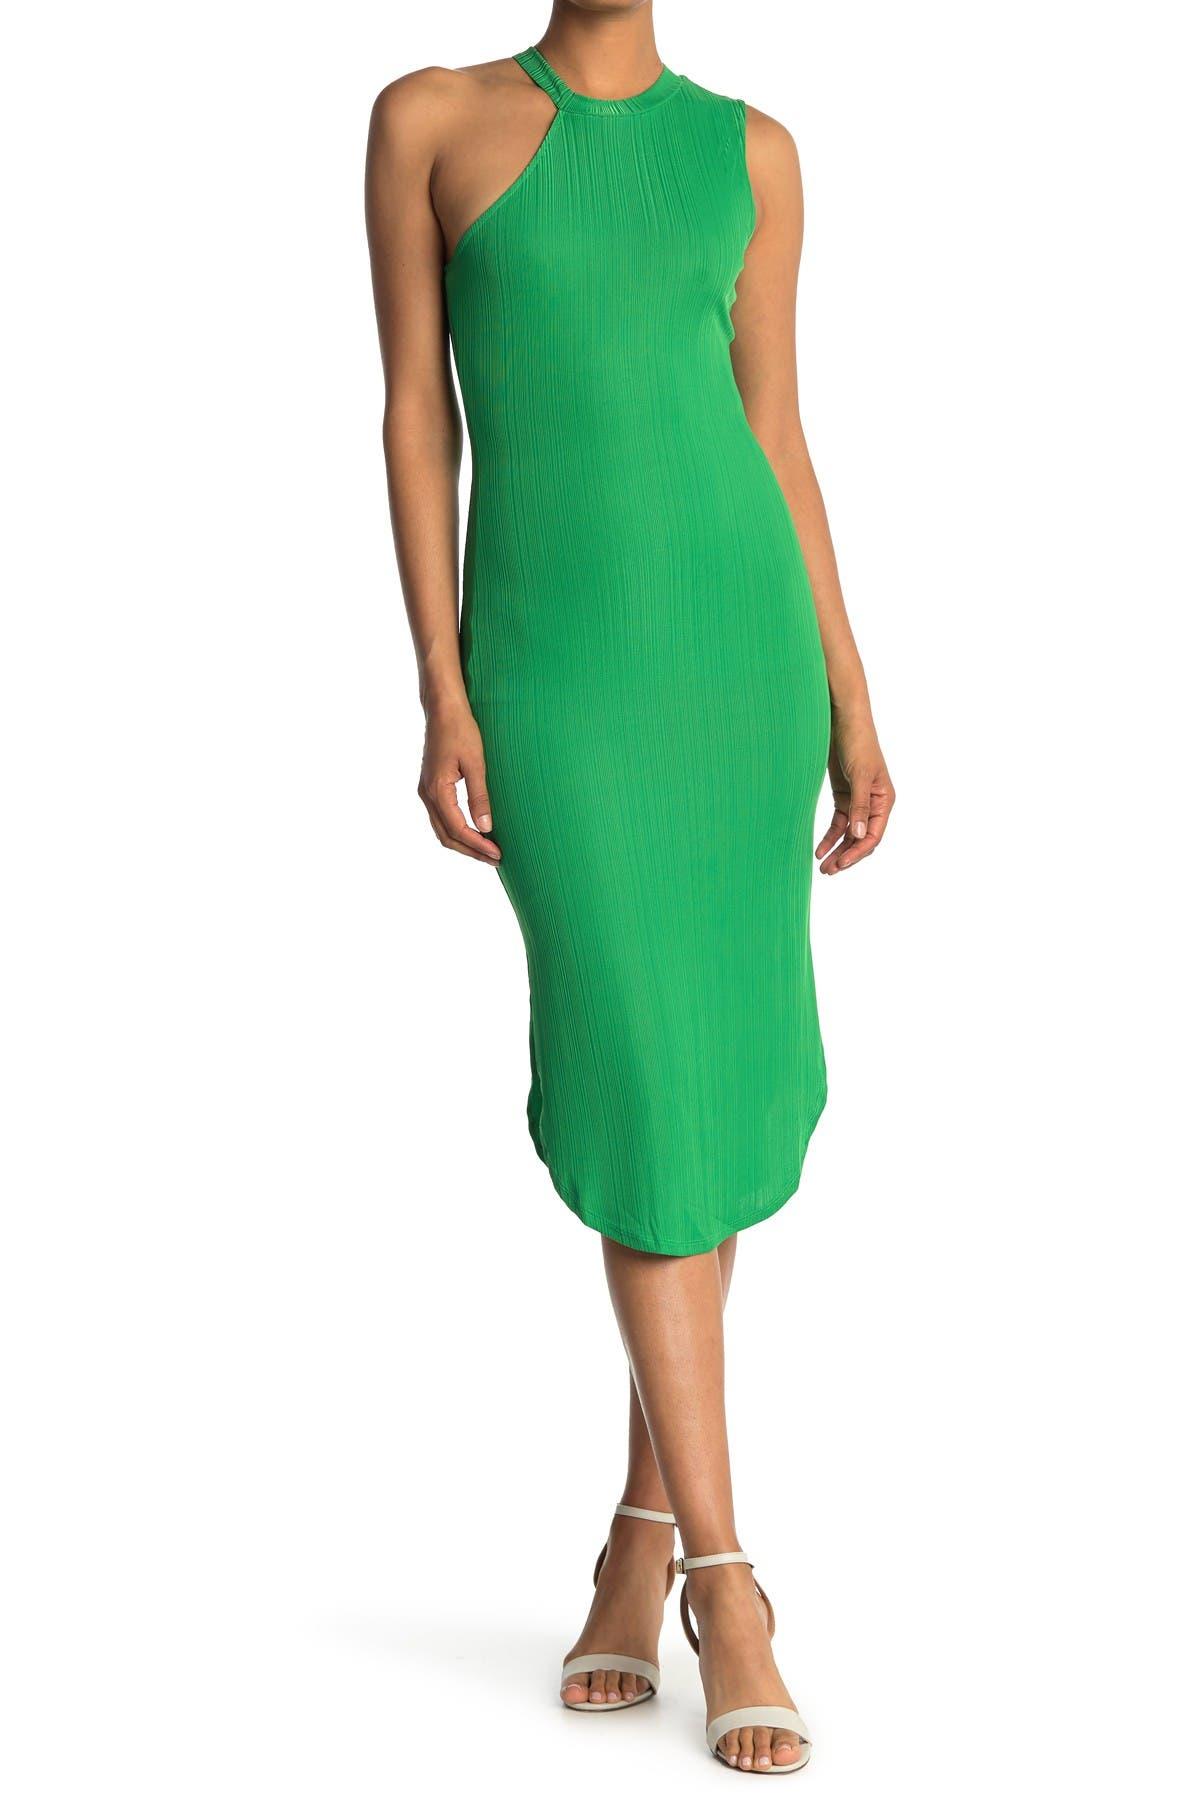 Image of NSR Aly Asymmetrical Knit Midi Dress